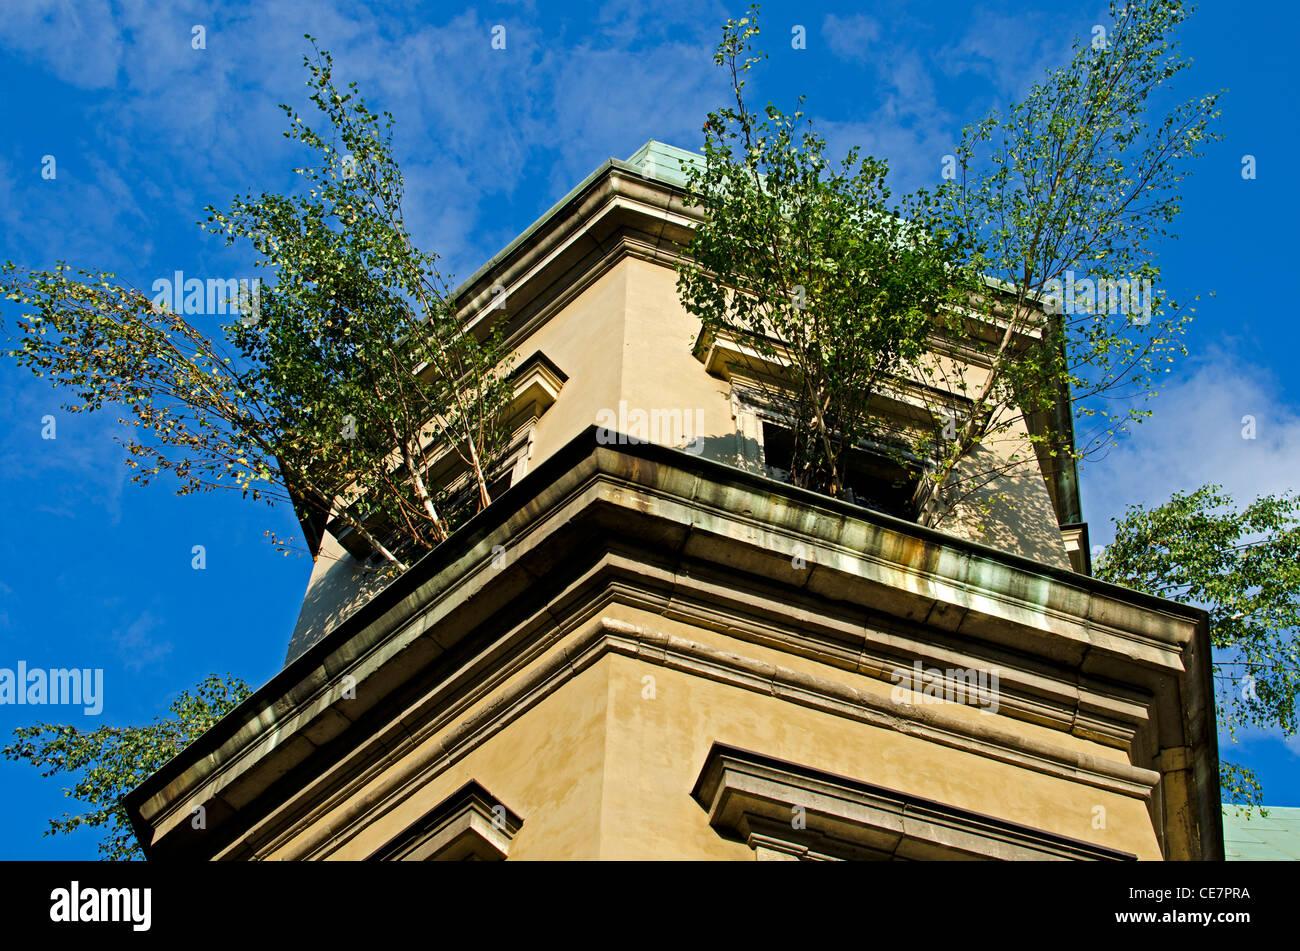 Tree growing in Ujazdow Castle through windows. - Stock Image